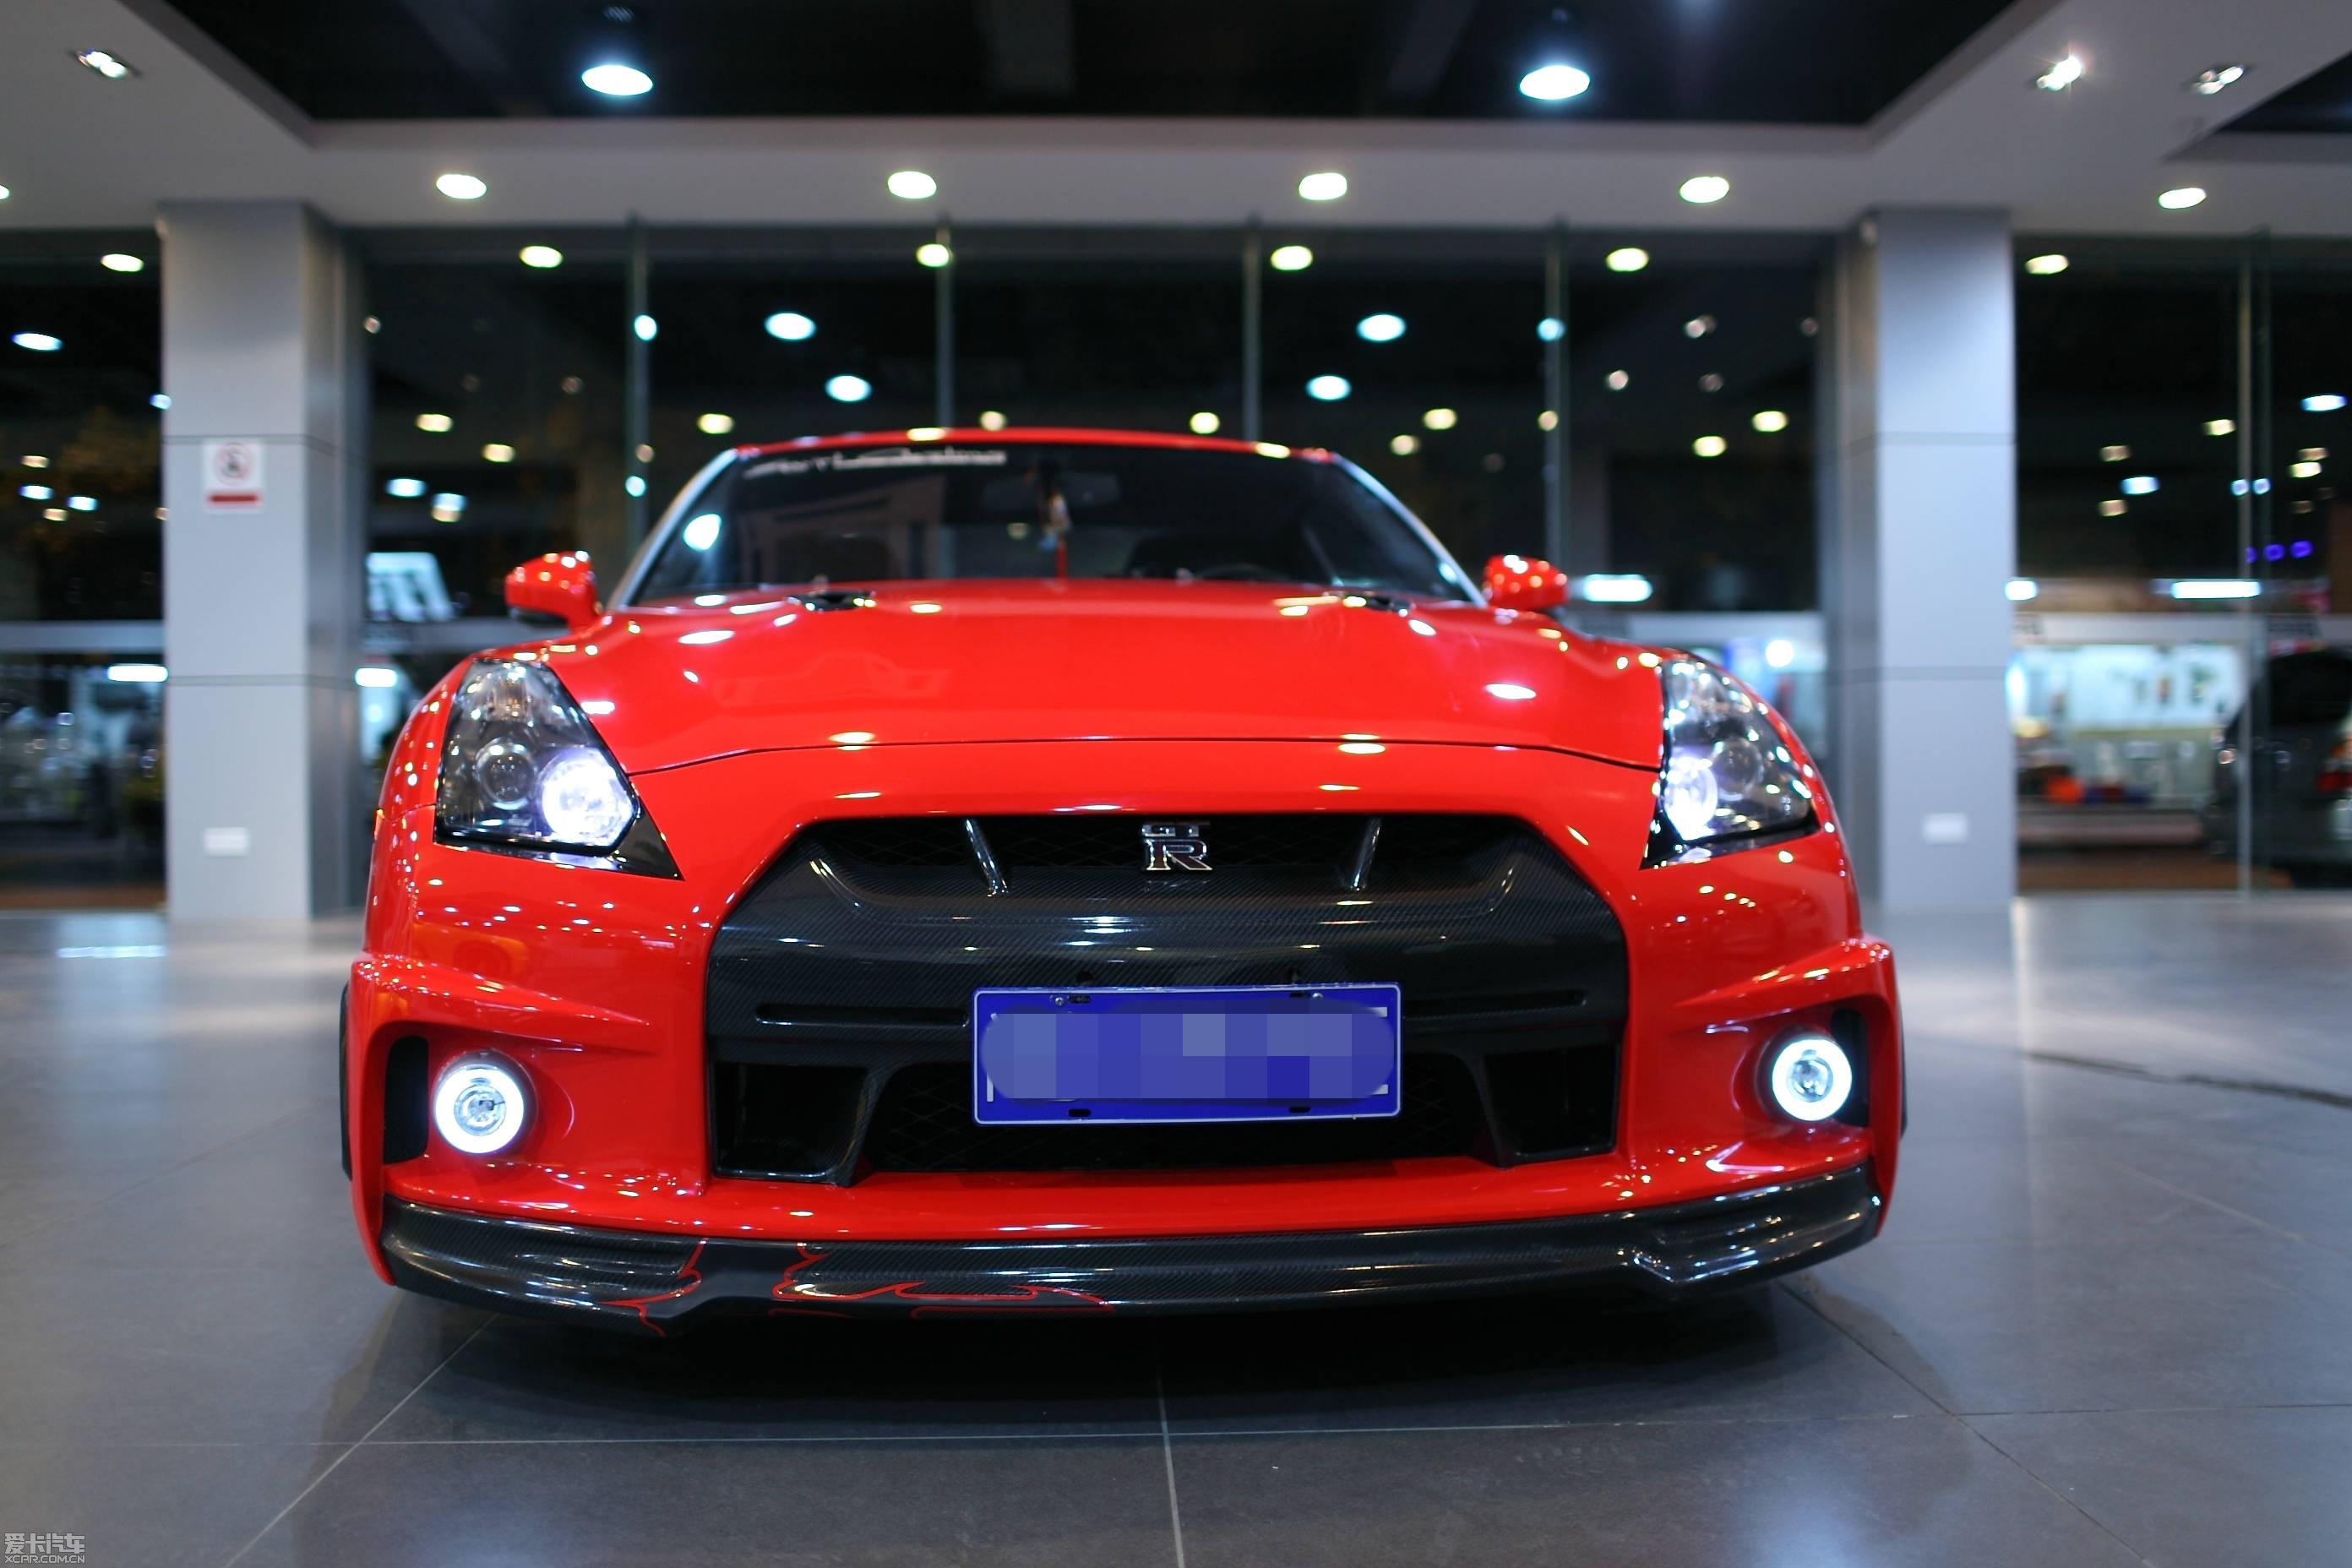 Nissan Gtr Impactante Fotos Hd Taringa